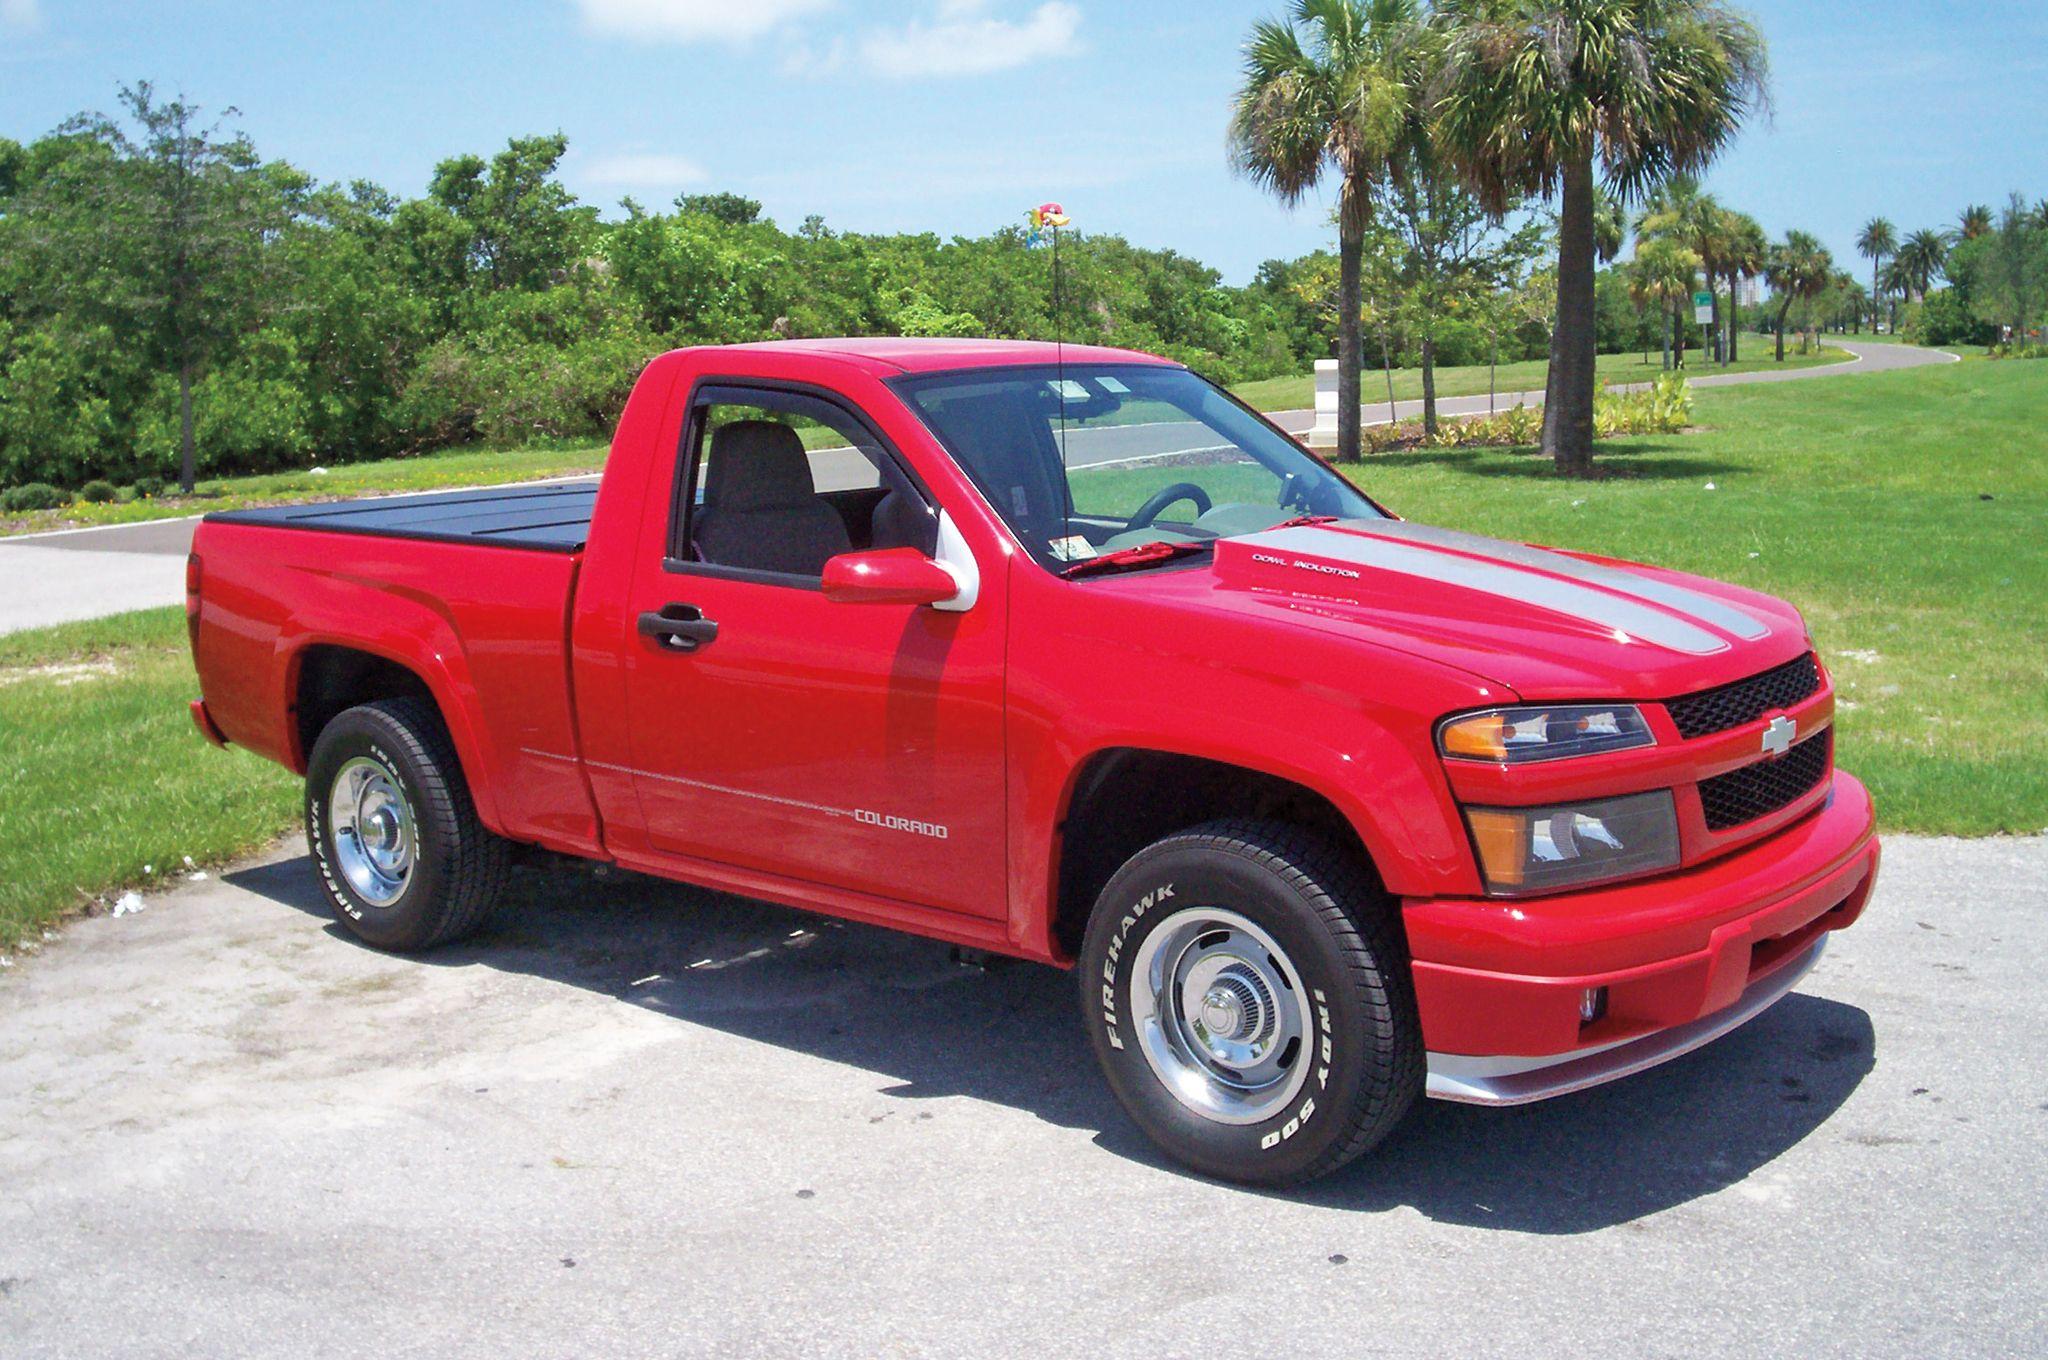 2005 Chevrolet Colorado Reviews and Rating Motor Trend